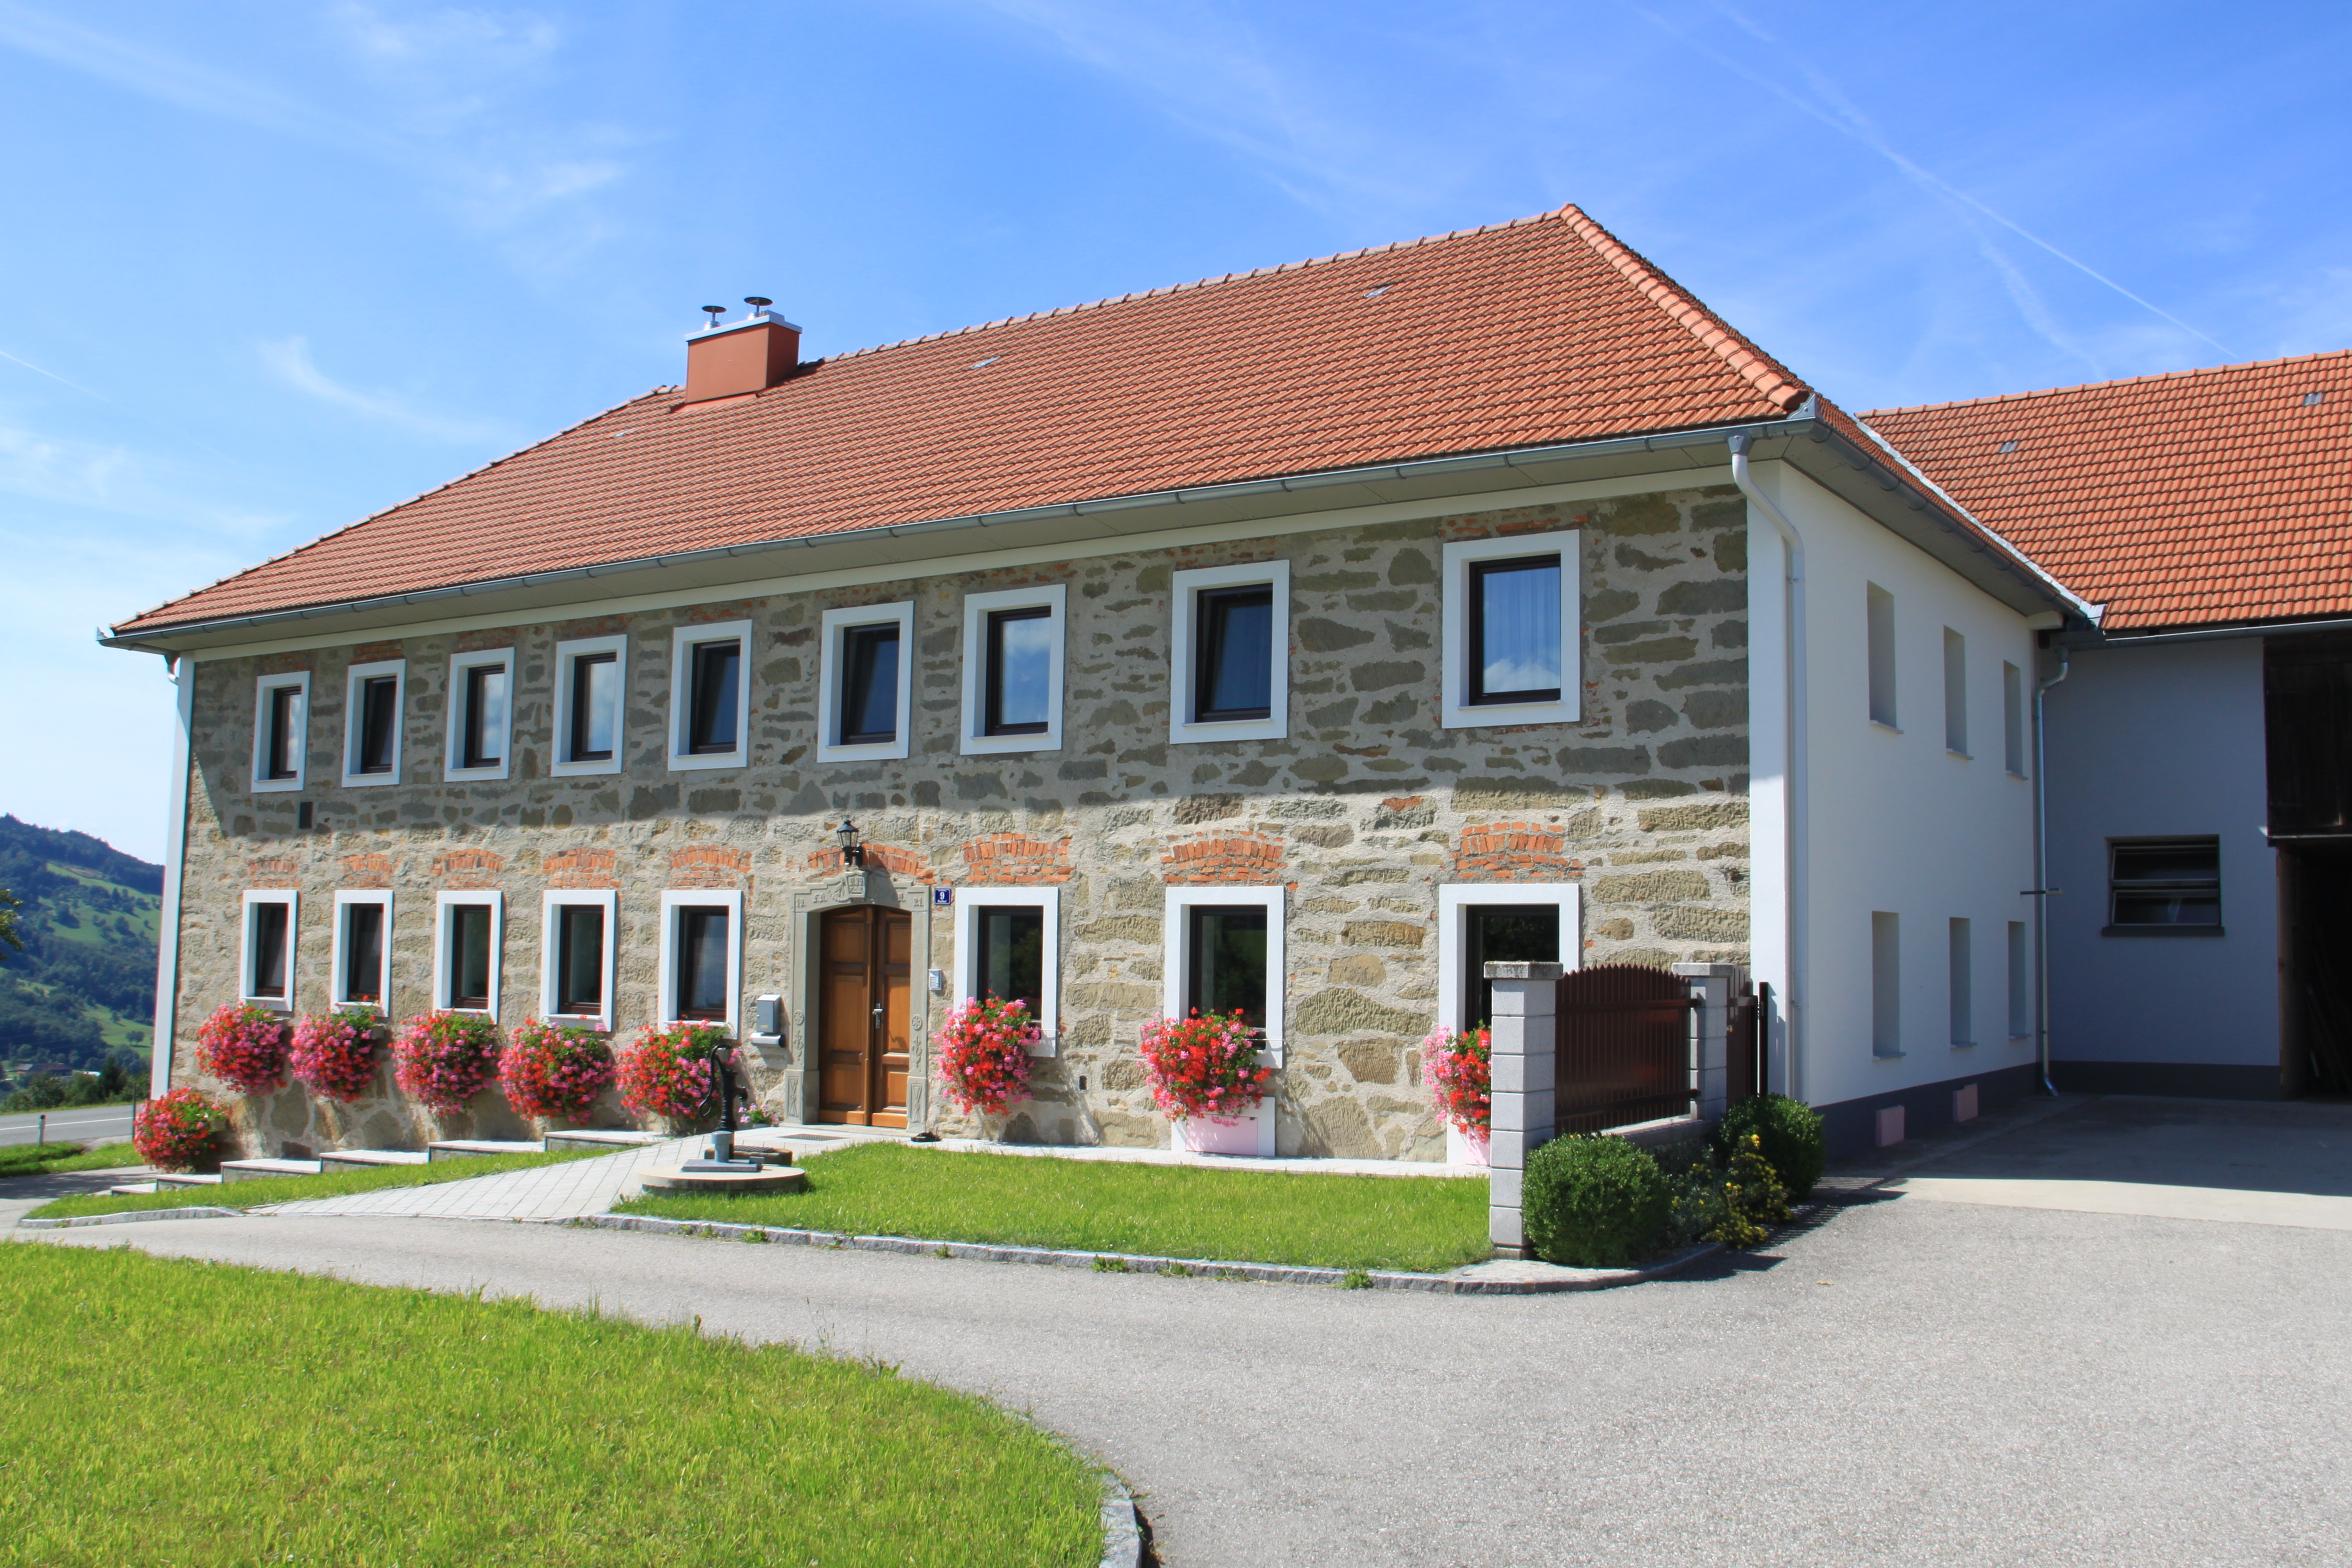 http://www.der-bauberater.at/wp-content/uploads/2015/12/Umbau-4kant-Bauernhof_02.jpg